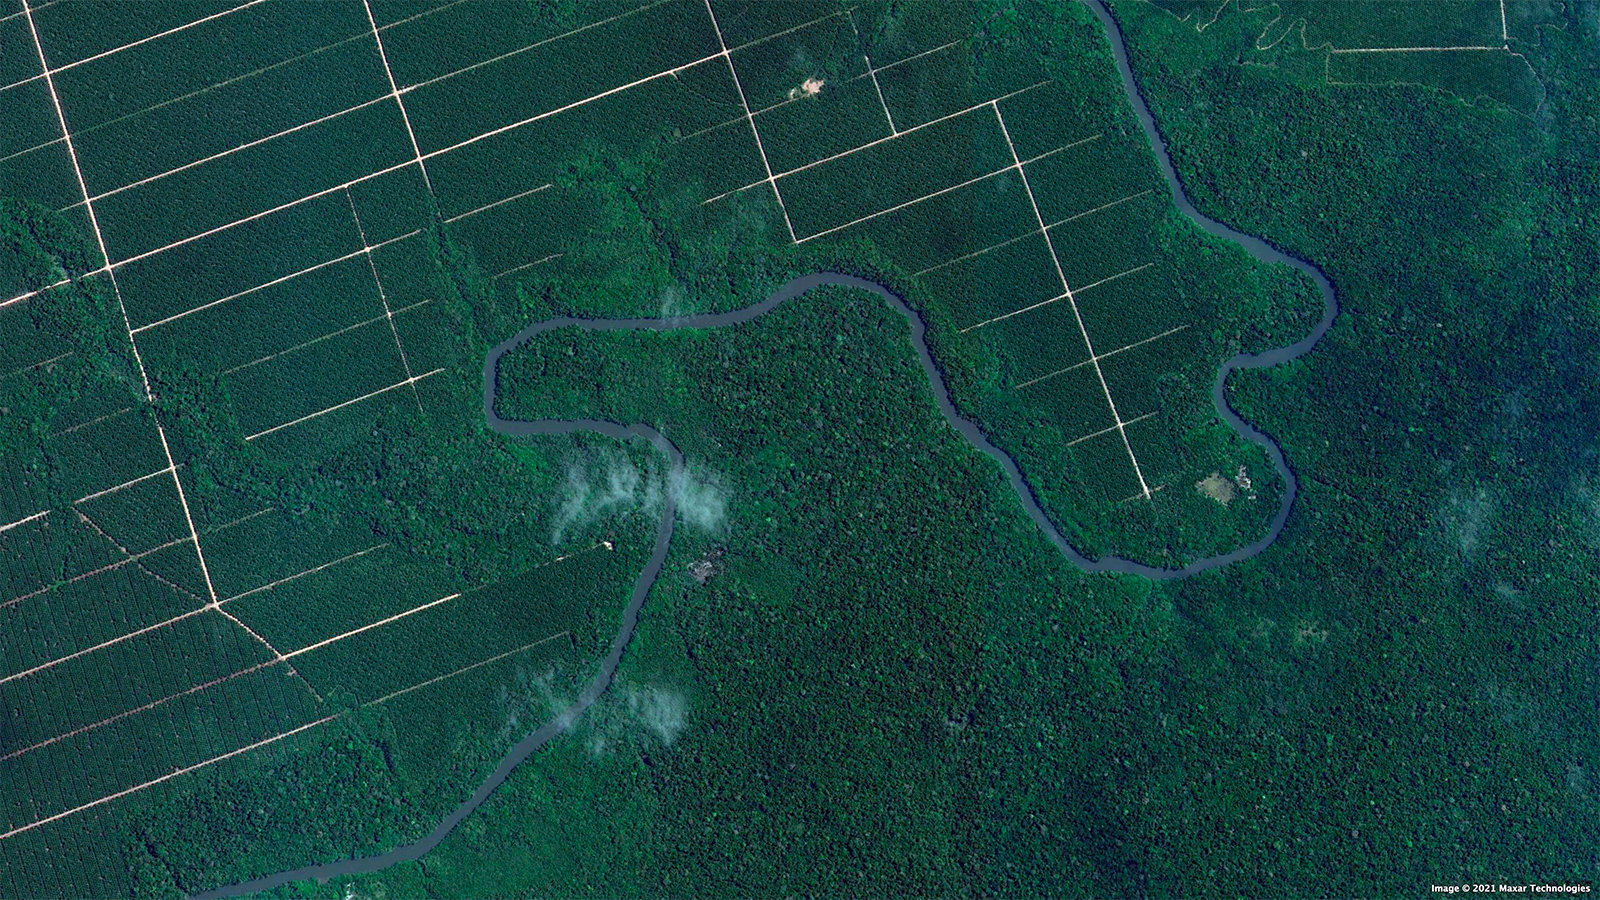 Satellite image of Agropalma's plantation near Tailândia, Brazil. Photo credit: Maxar Technologies.